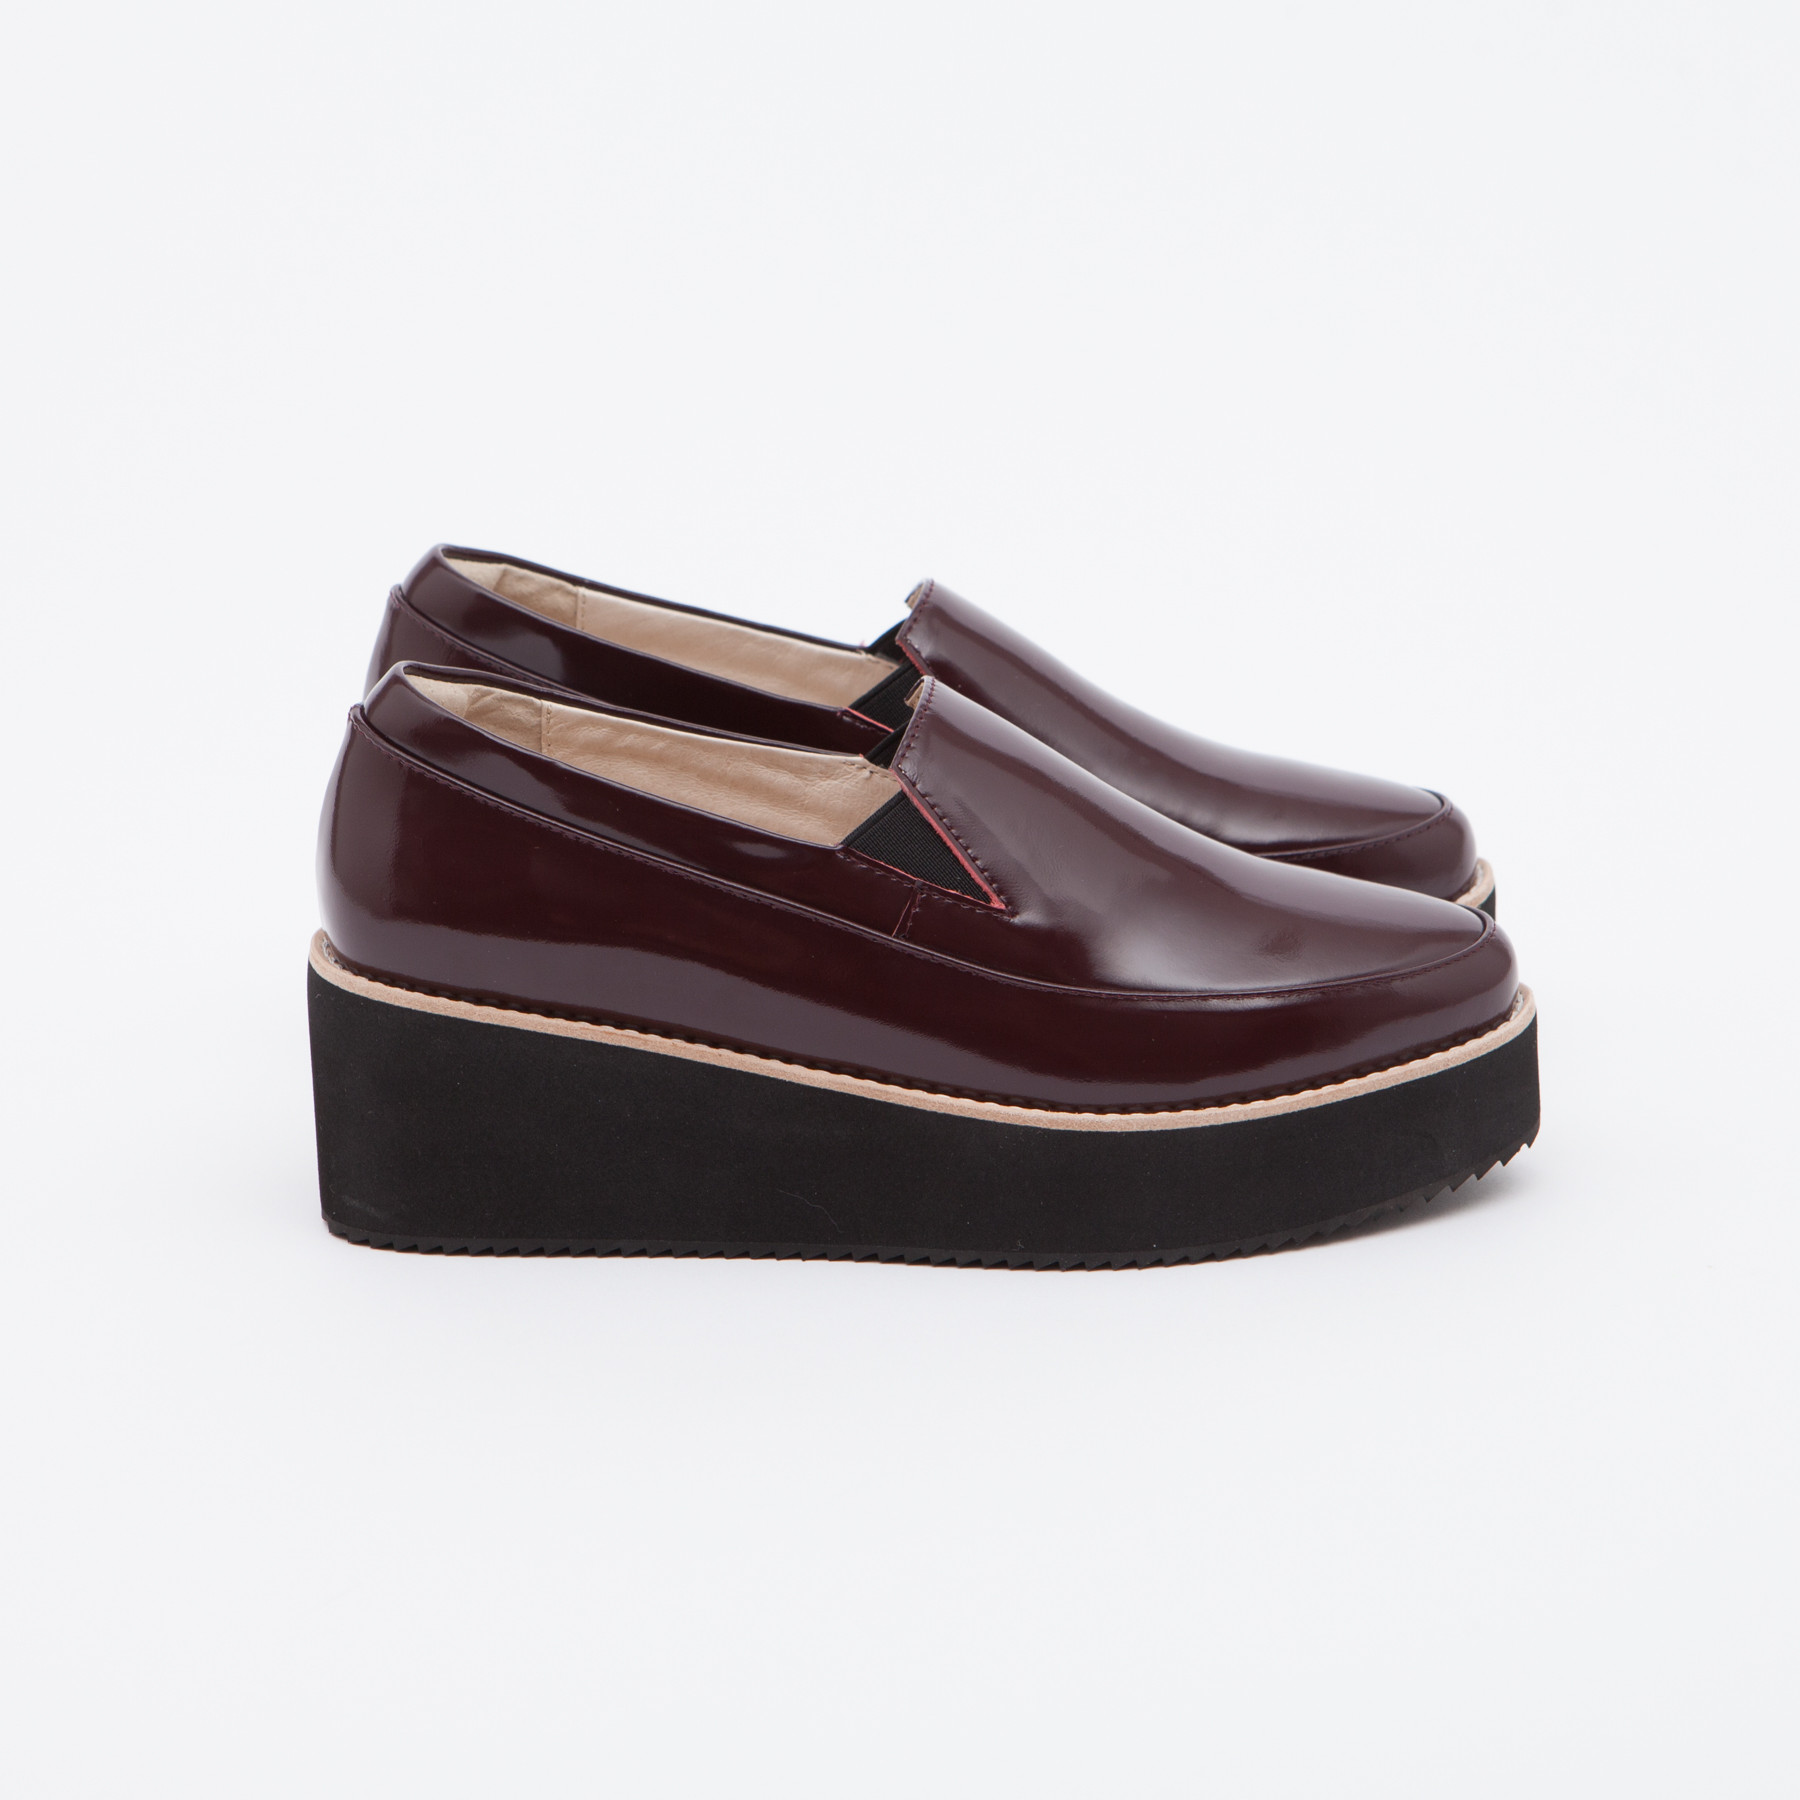 trouva sol sana wine tabbie wedge shoes